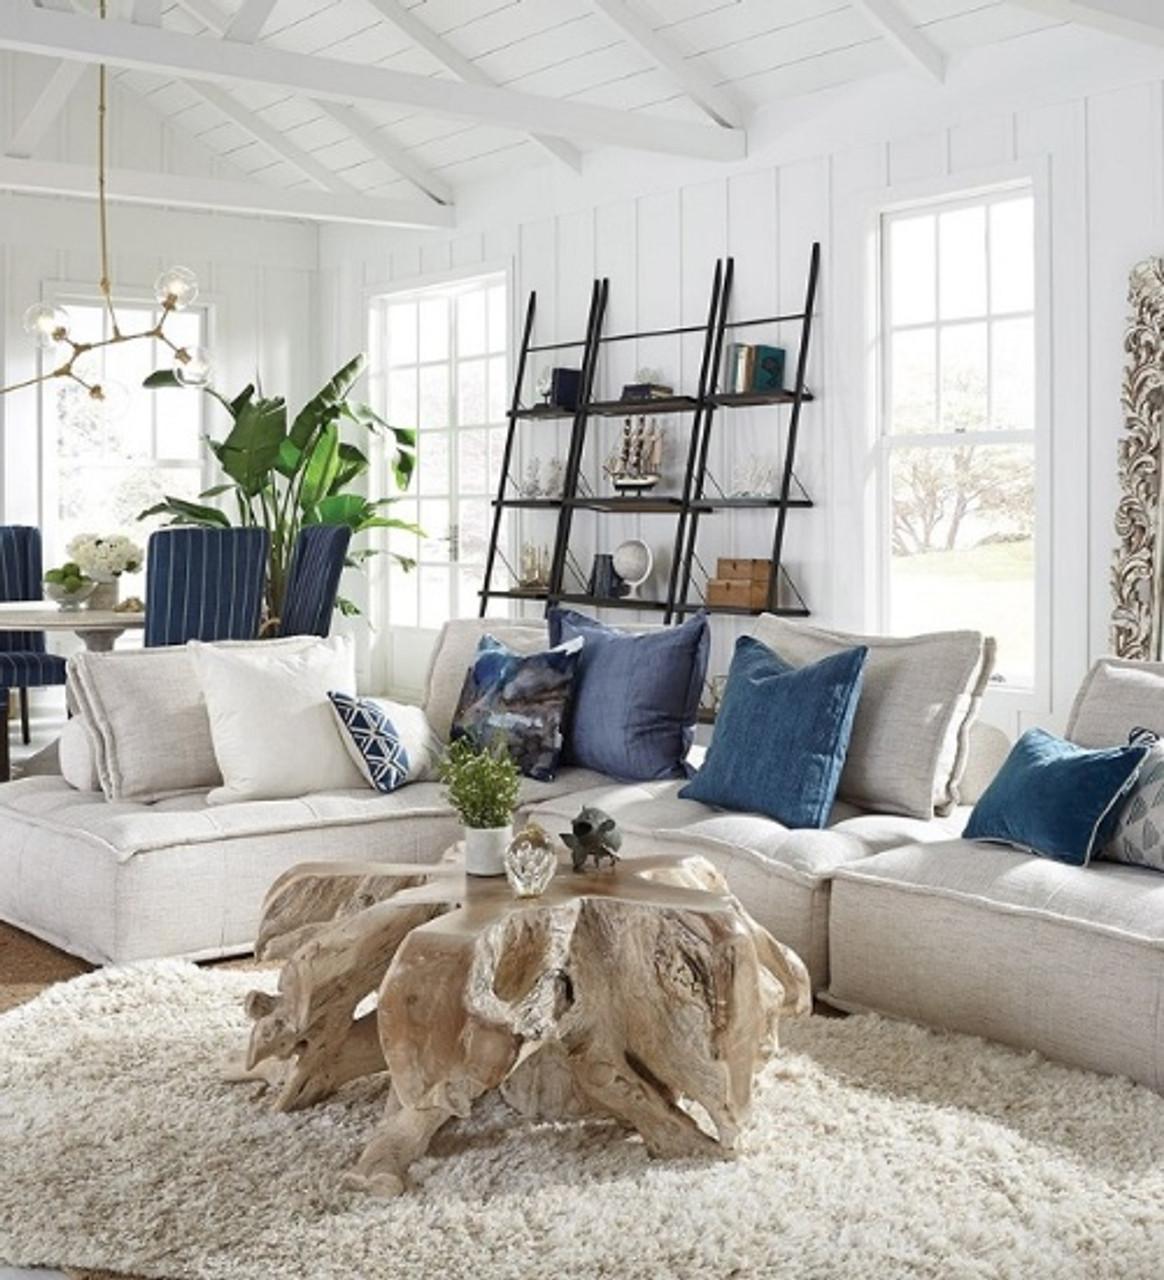 8 Amazing Coastal Decorating Ideas to Try - Zin Home